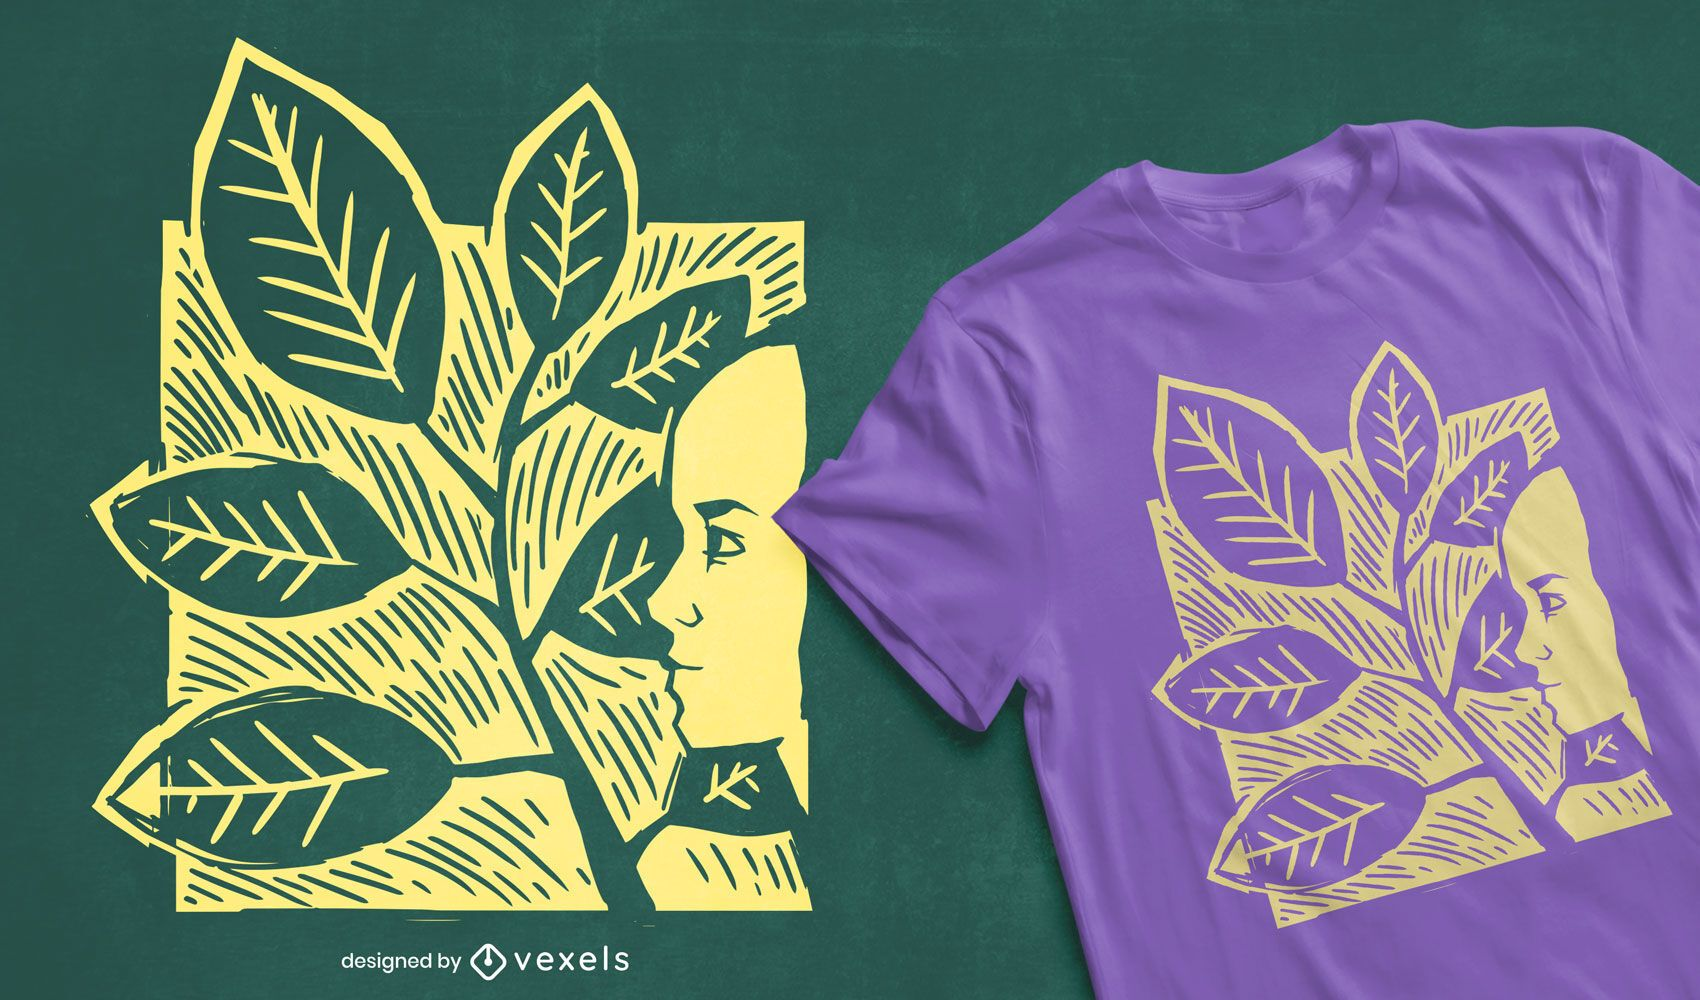 Leaves woman t-shirt design